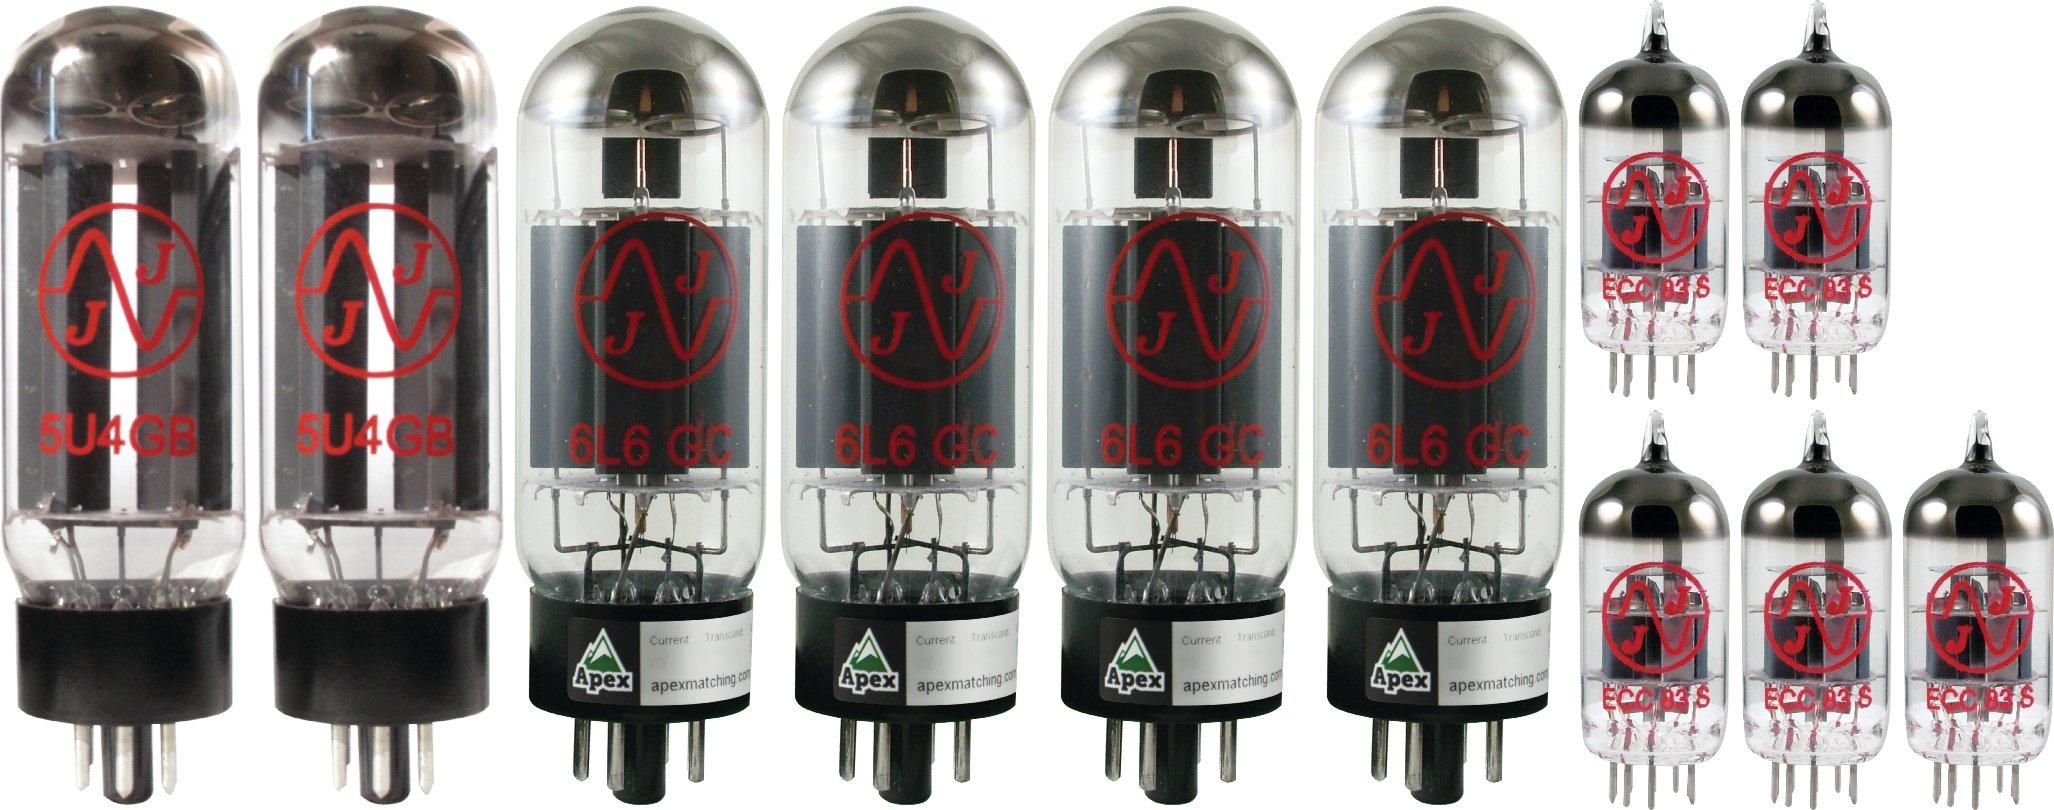 Mesa Boogie Dual Rectifier Tube Set, JJ Tubes (x4 6L6GC, x5 12AX7, x2 5U4GB)